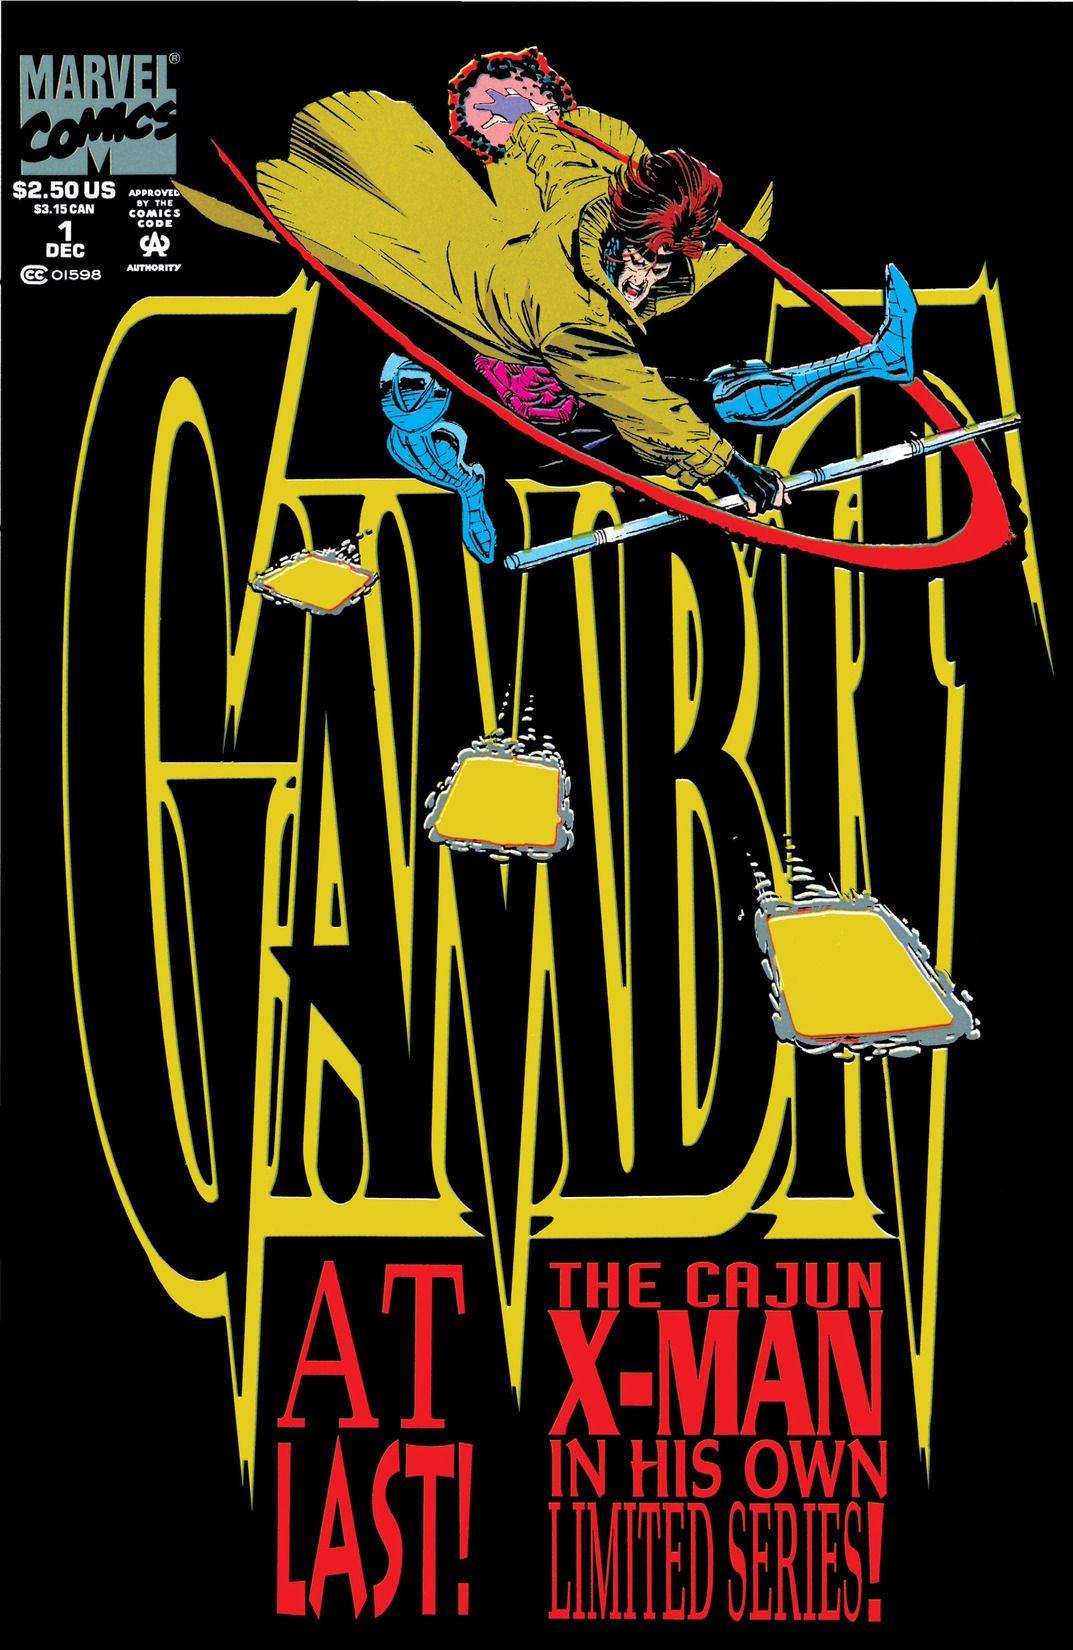 Gambit_Vol_1_1.jpg